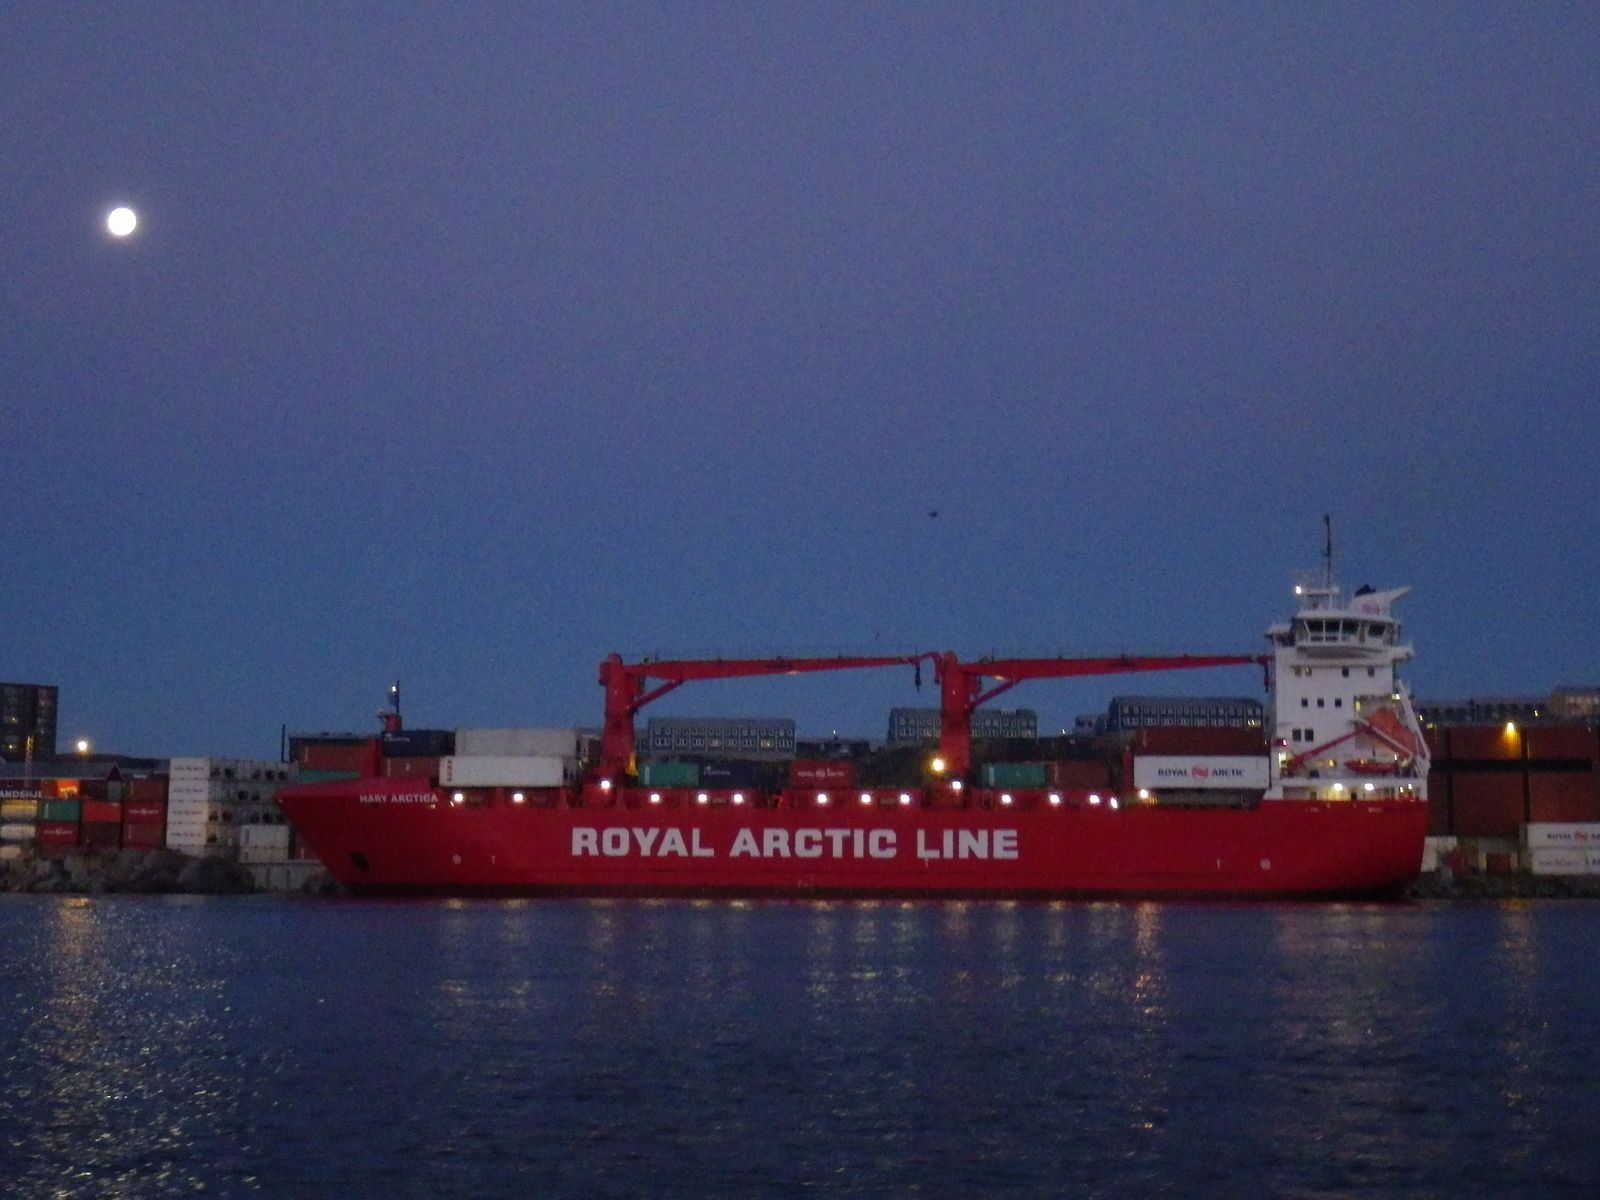 2013-10-20-1101_-_gode_1_maanen_naja_arctica_ral-skib